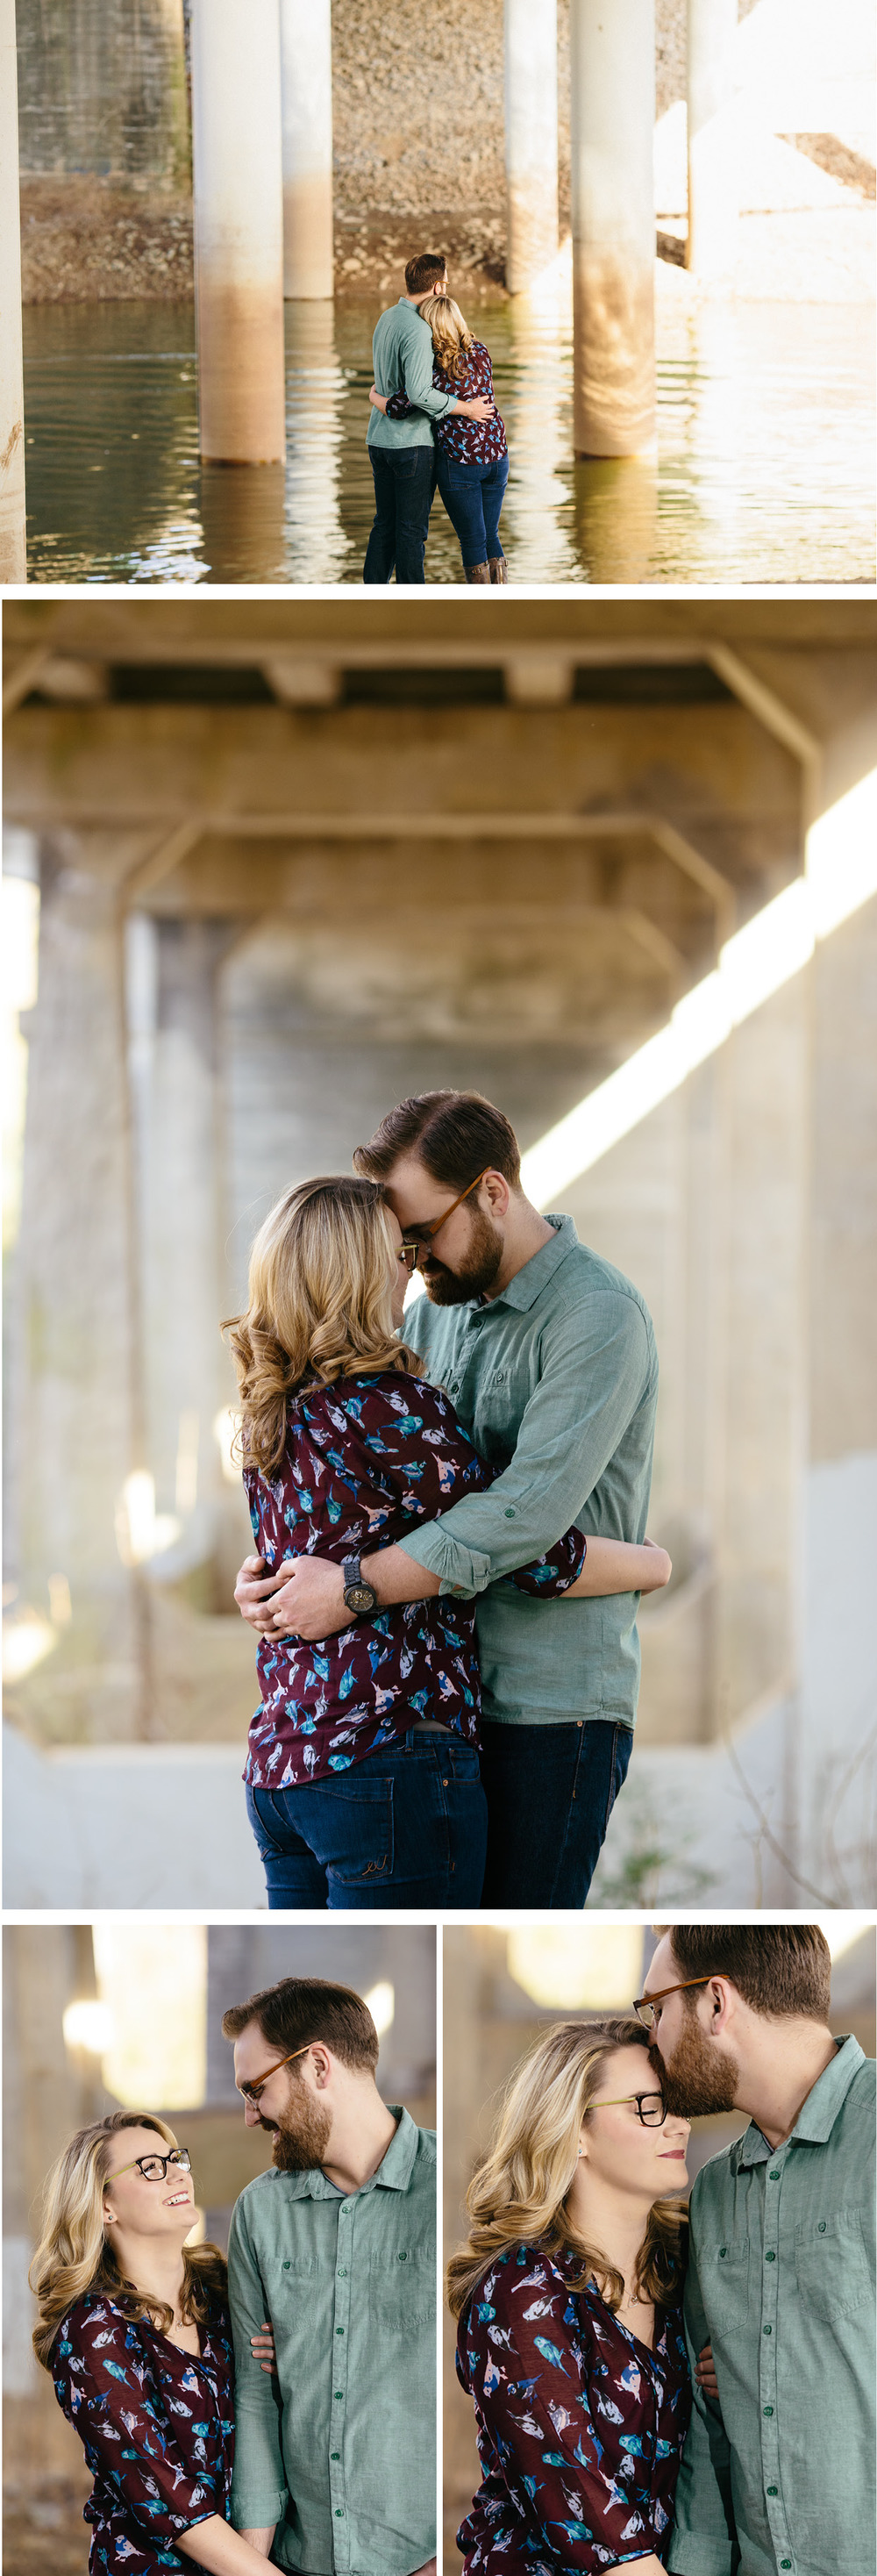 CK-Photo-Nashville-Engagement-Photographer-st-2.jpg